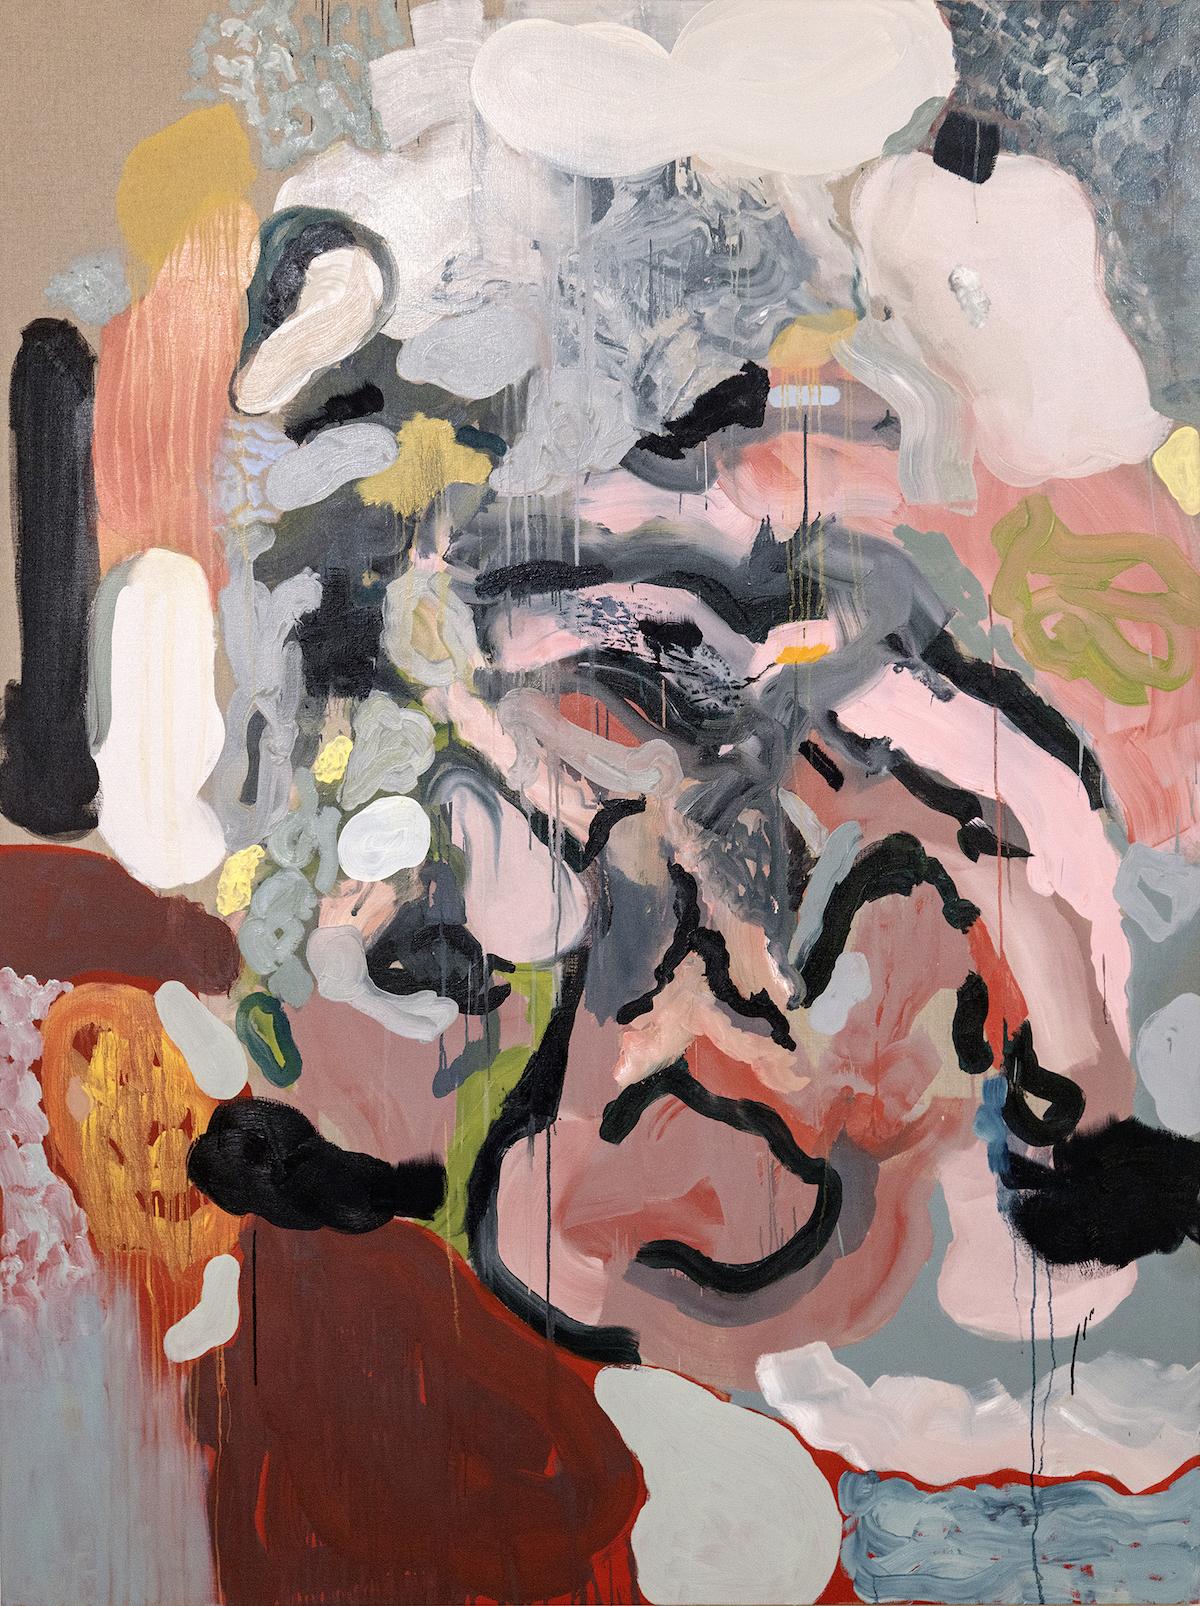 Glycine II, 2019, Oil on Linen, 180 x 240 cm